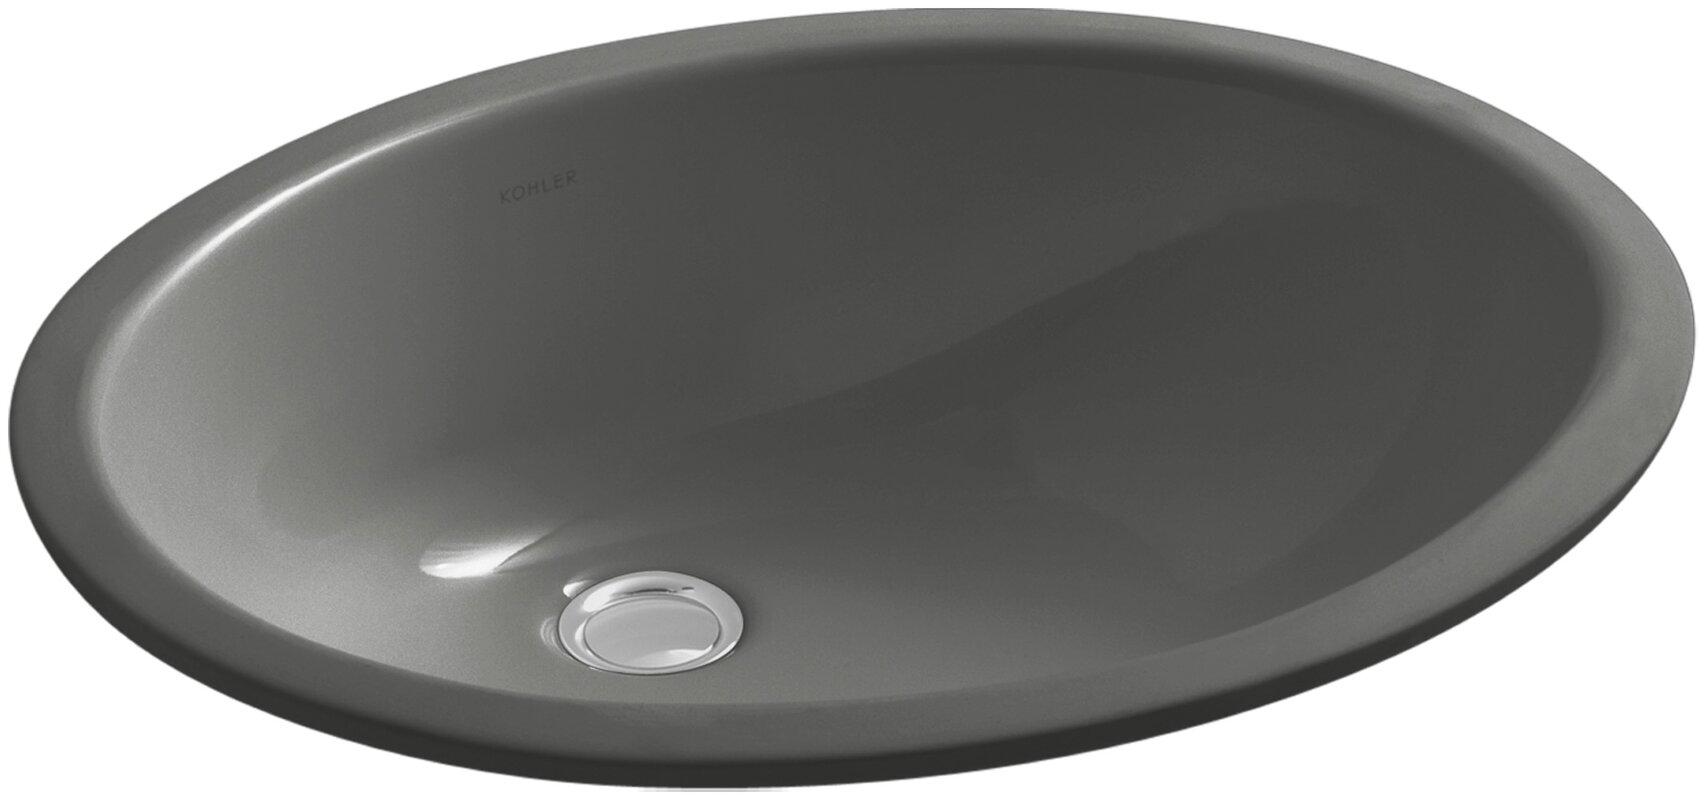 Grey Undermount Bathroom Sink kohler caxton oval undermount bathroom sink with overflow